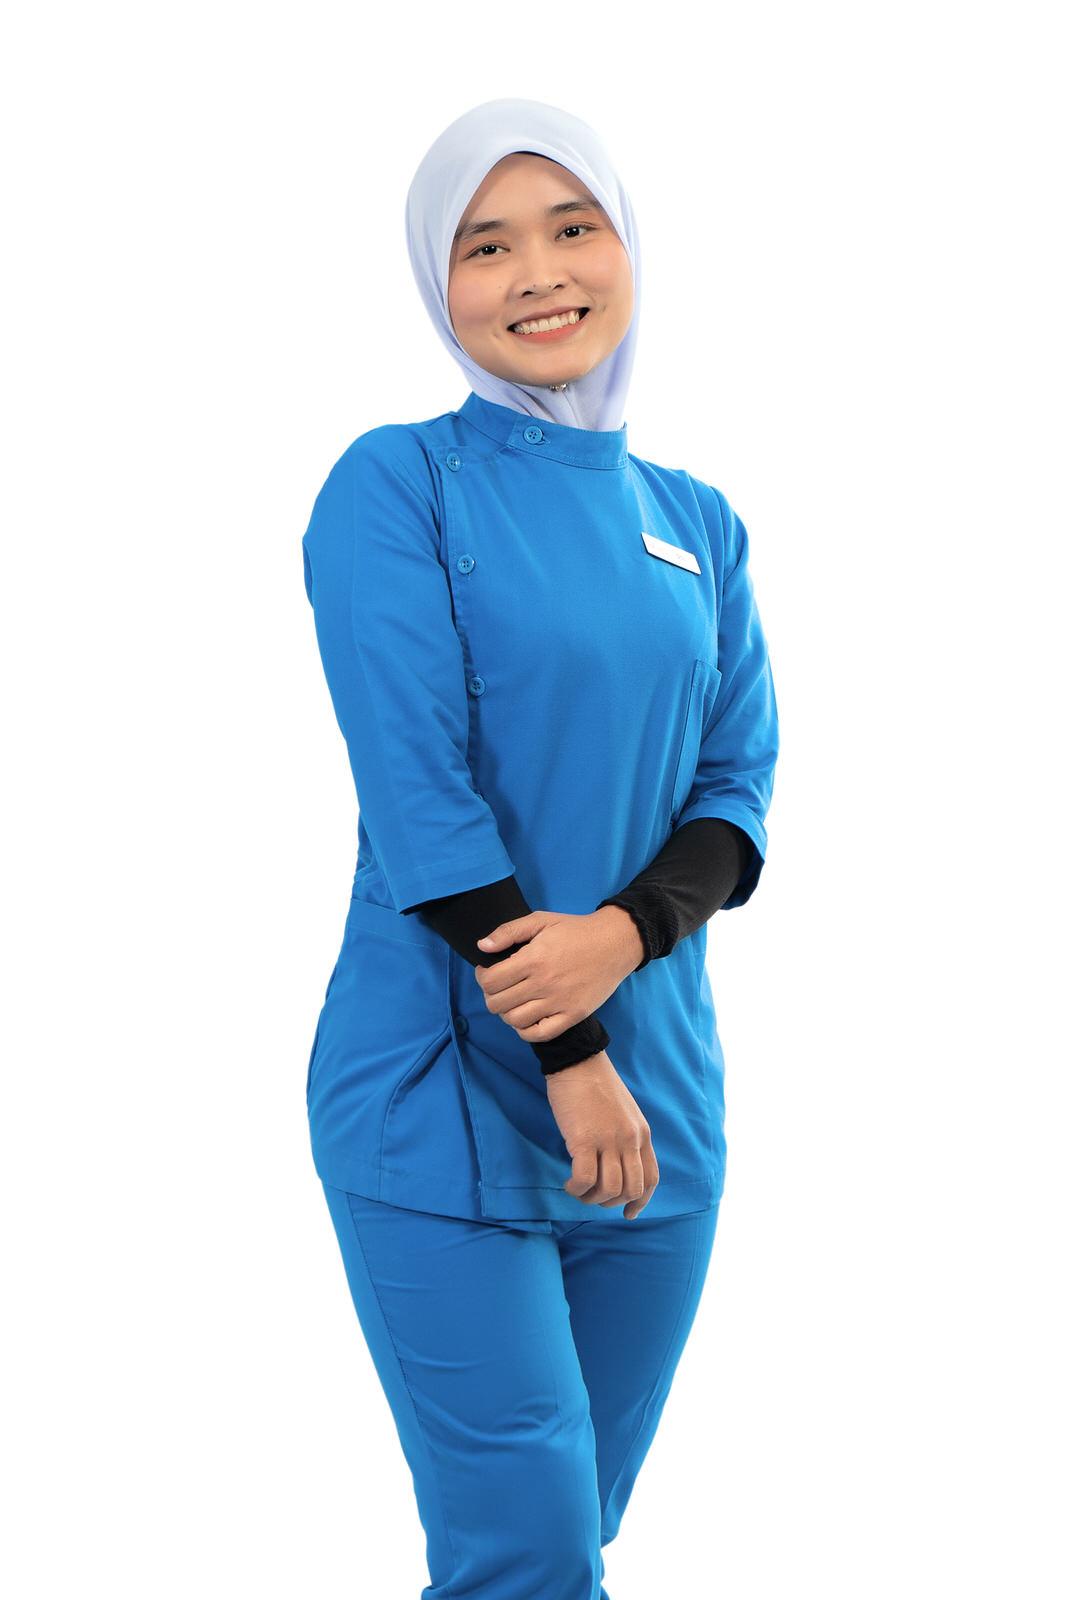 Siti Hasniza Binti Sudin